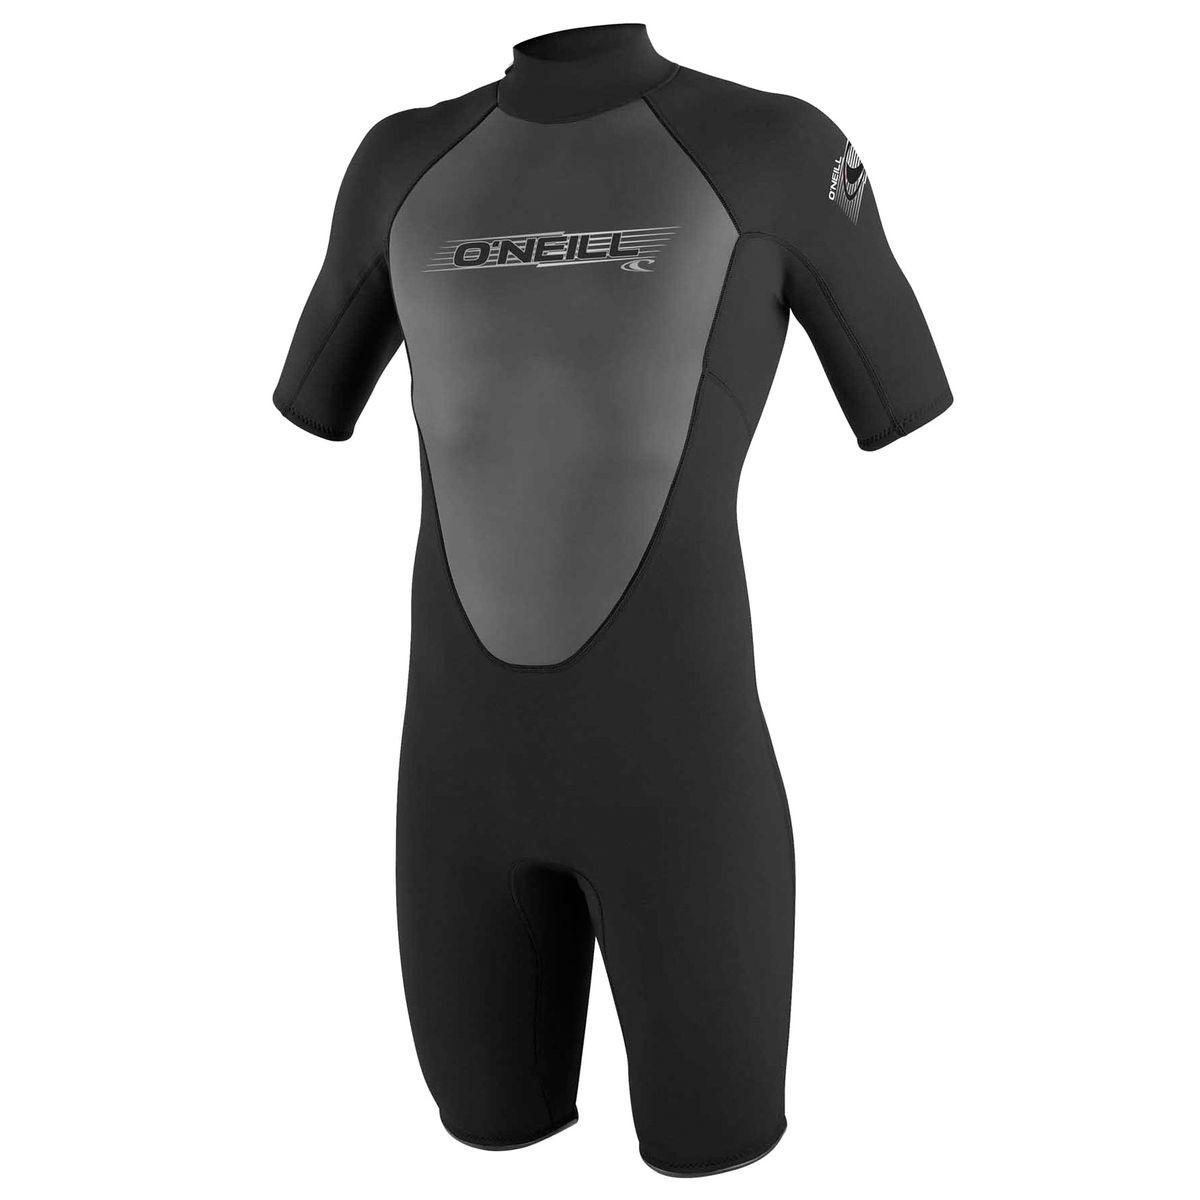 O'Neill Reactor 2mm Shorty Wetsuit - Black/ Black/ Black